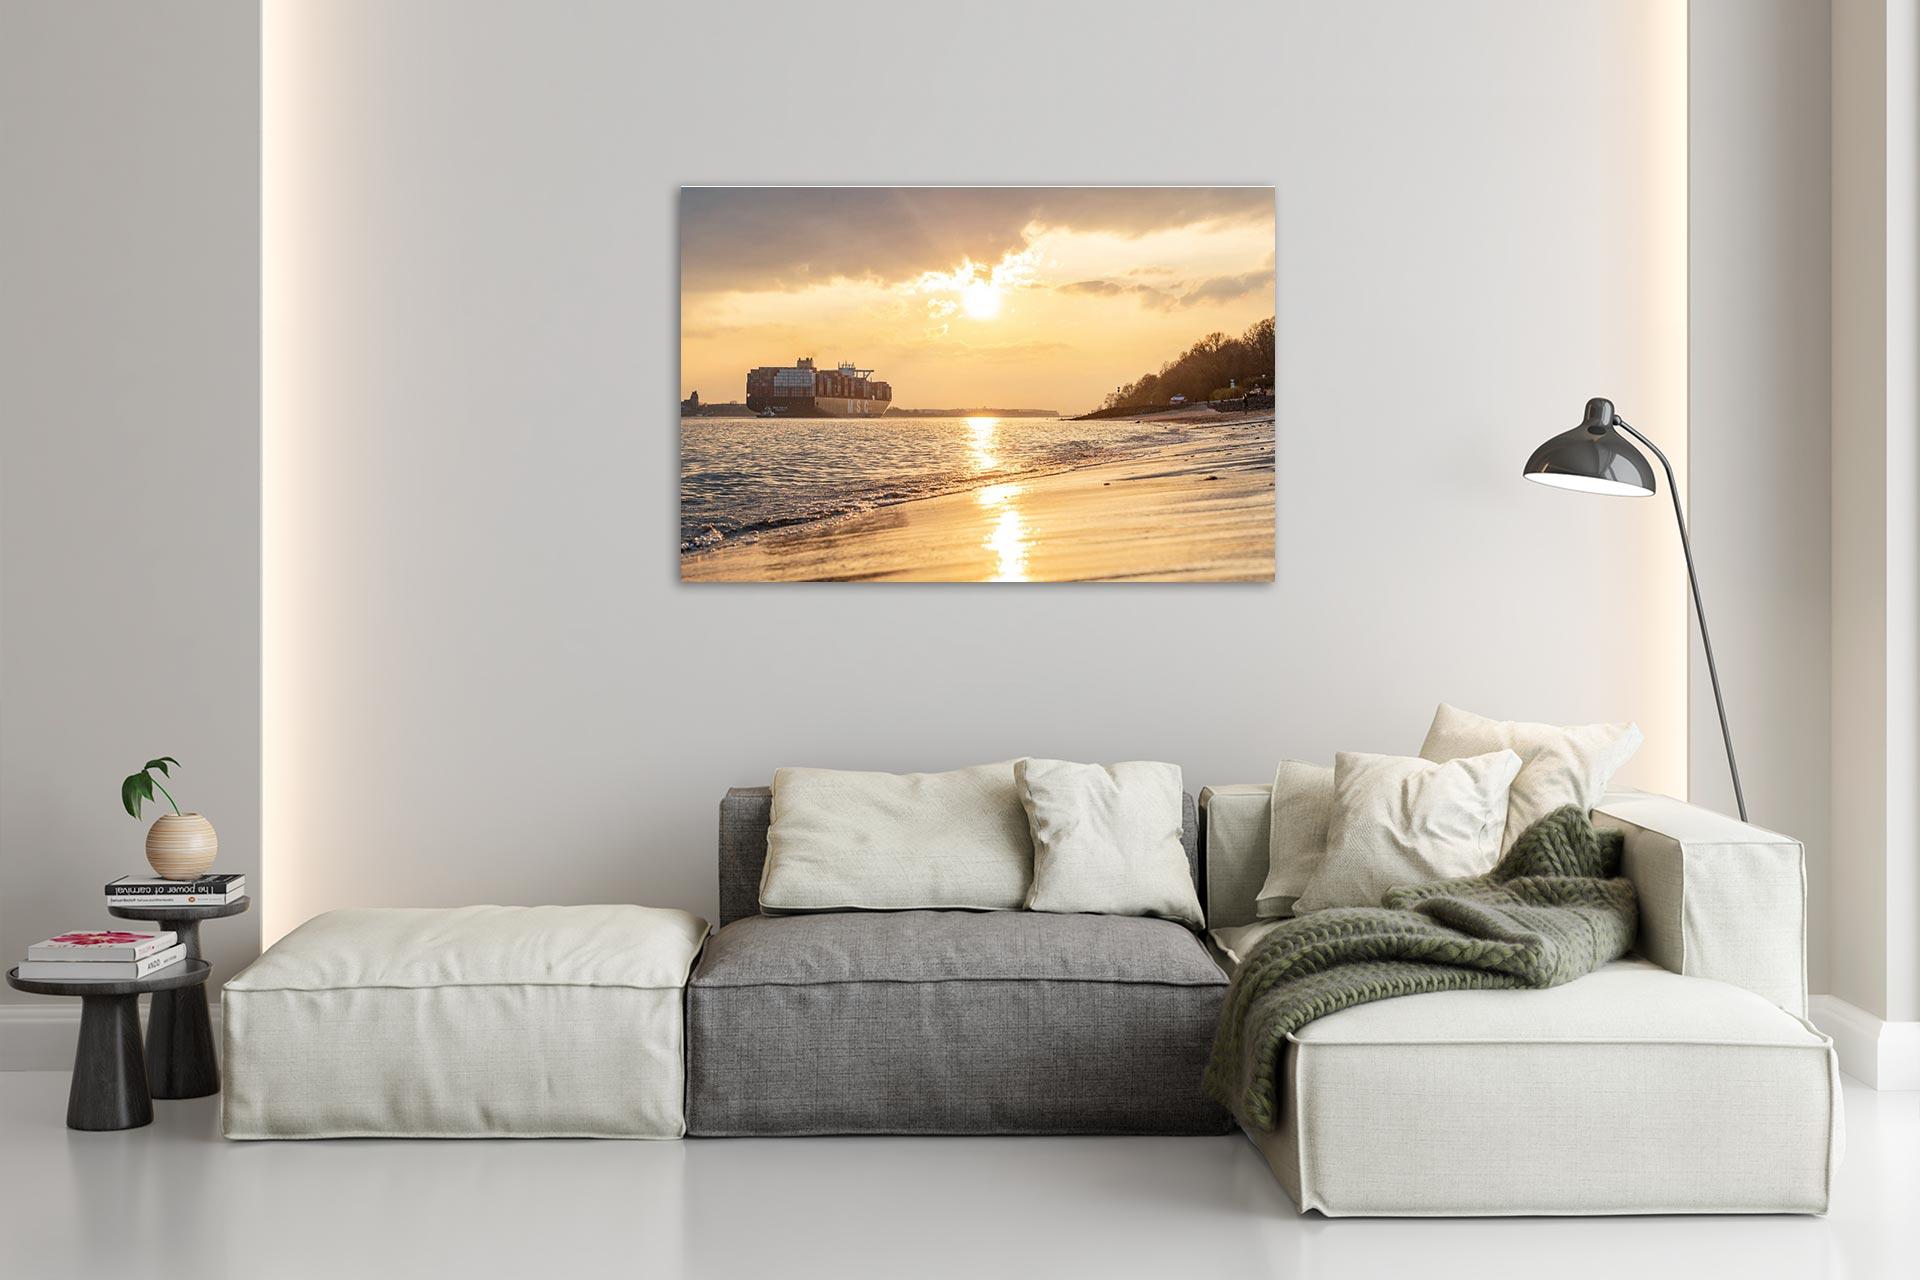 LCW262-maya-hamburg-wandbild-bild-auf-leinwand-acrylglas-aludibond-wohnzimmer